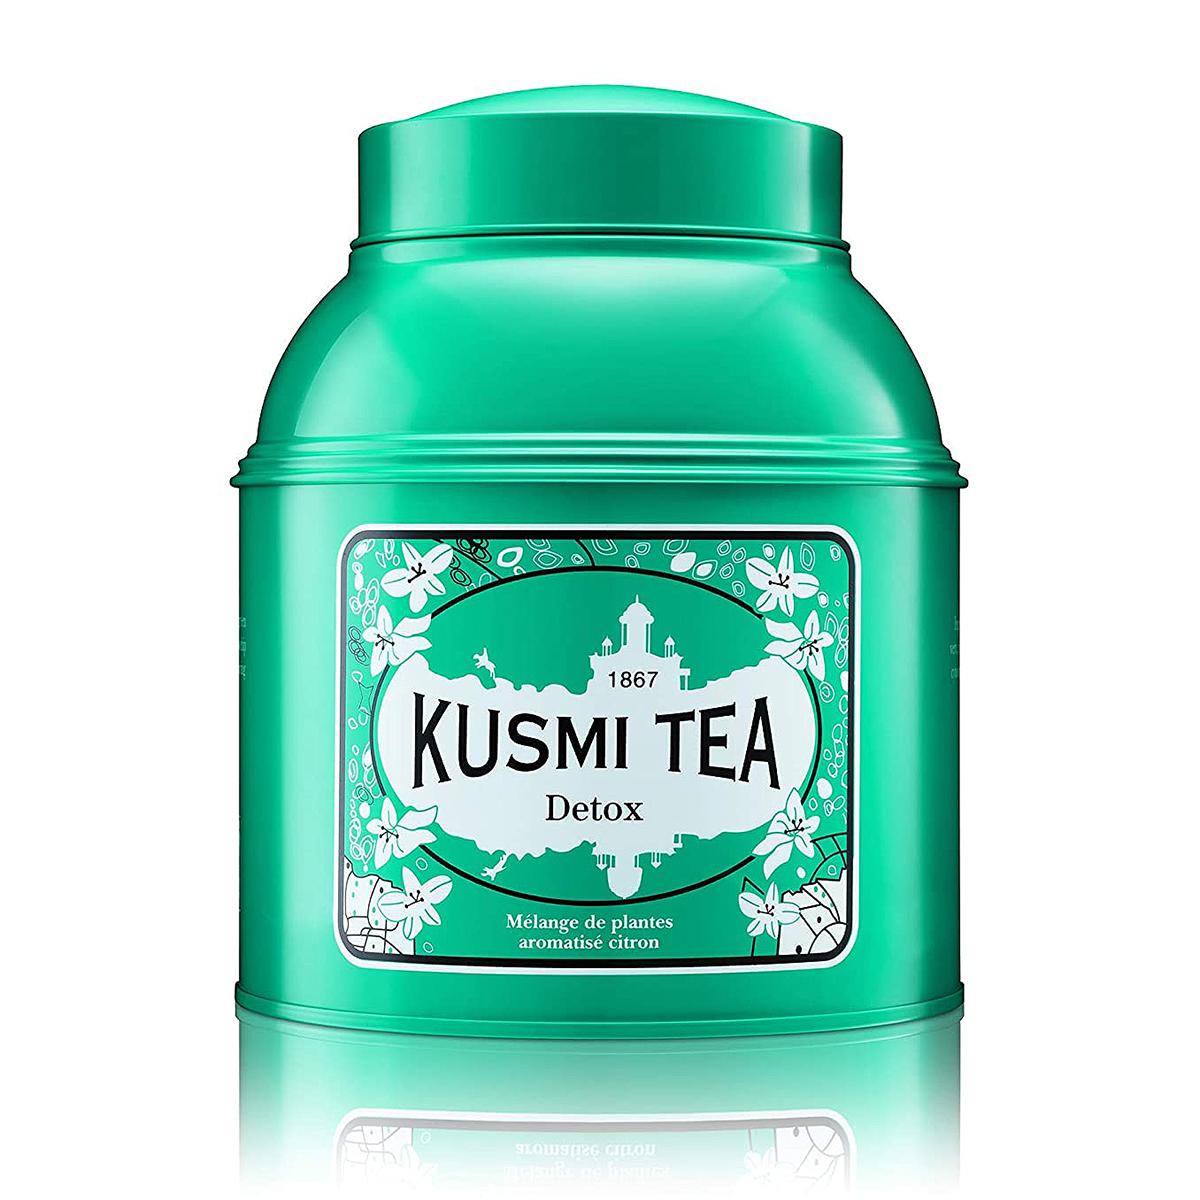 kusmi-tea-detox